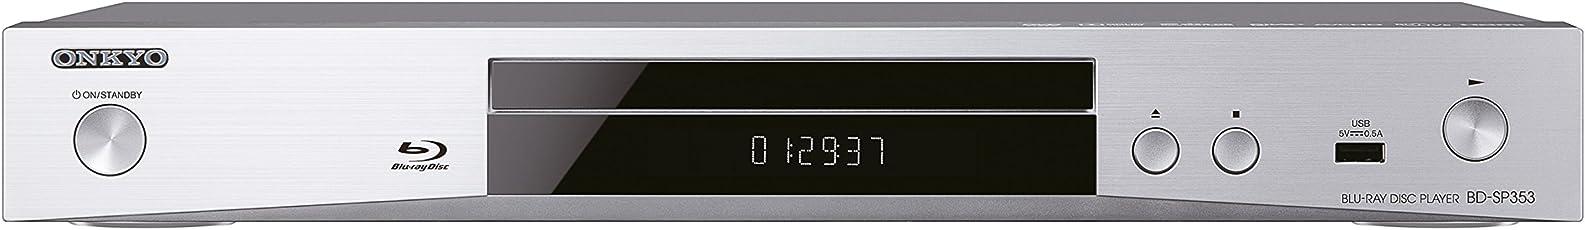 Onkyo BD-SP353 (S) Blu-Ray Player (1080p Upscaling, AVCHD/DivXPlus HD/MKV/flac/MP3, BD-Live) Silber